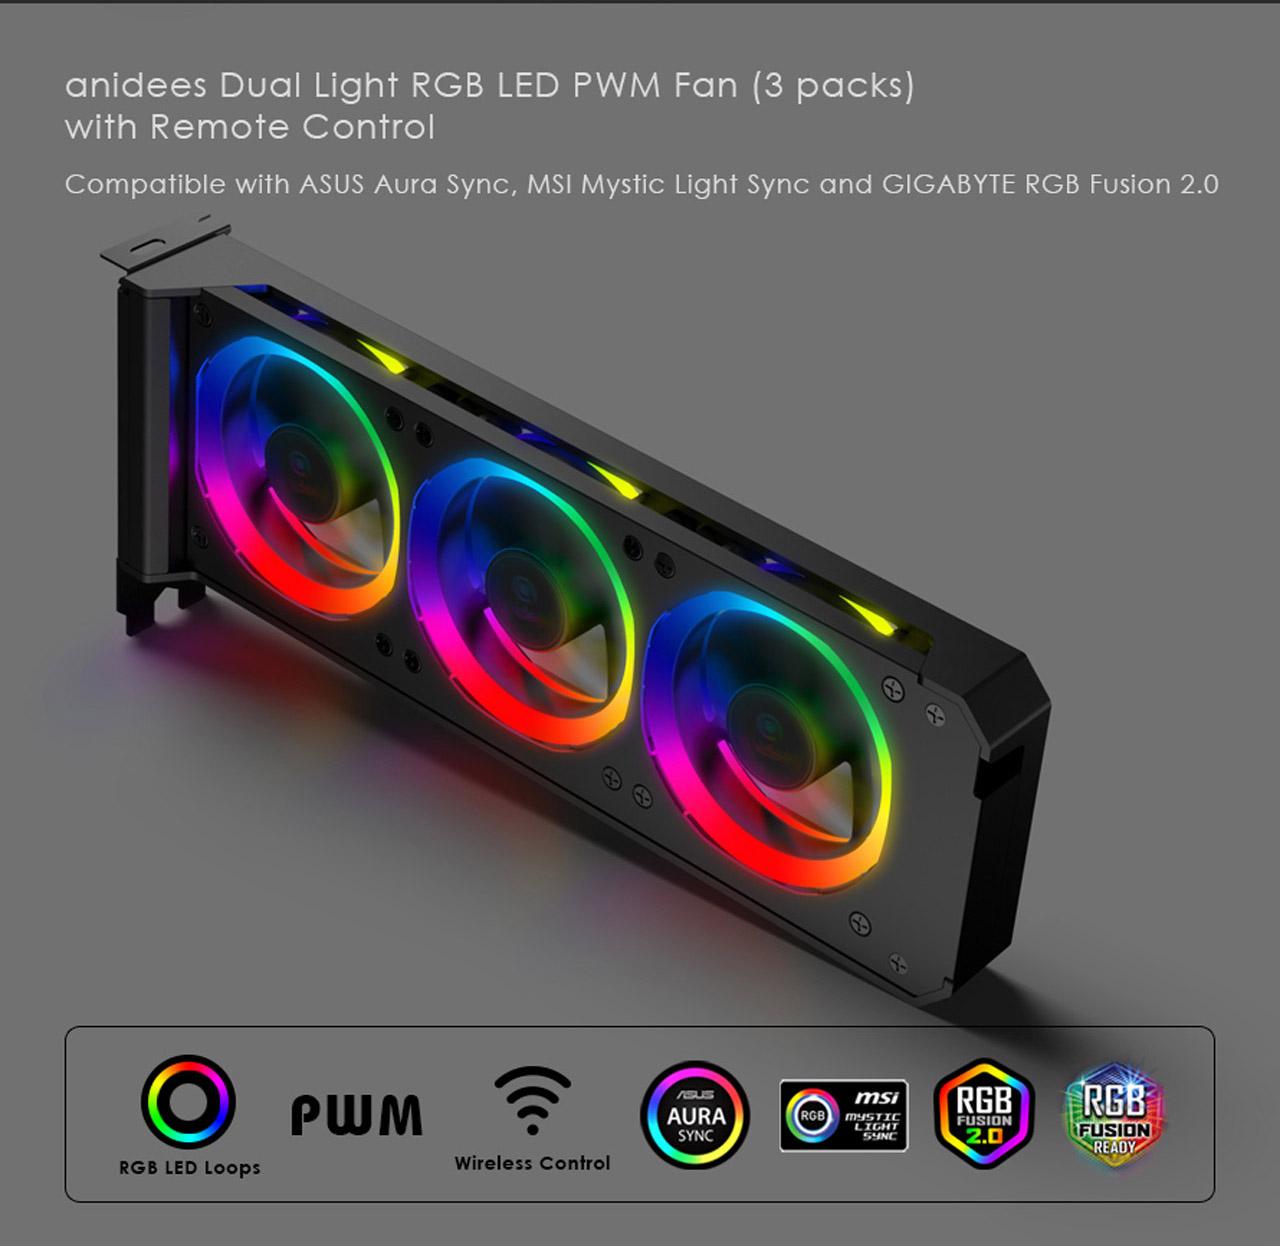 Anidees Graphic Card Cooler 3 x 80mm PWM Fan, Support ASUS Aura SYNC/MSI  Mystic Sync/ASROCK Aura RGB/GIGABYTE RGB Fusion (5V 3-Pin Addressable  Headers